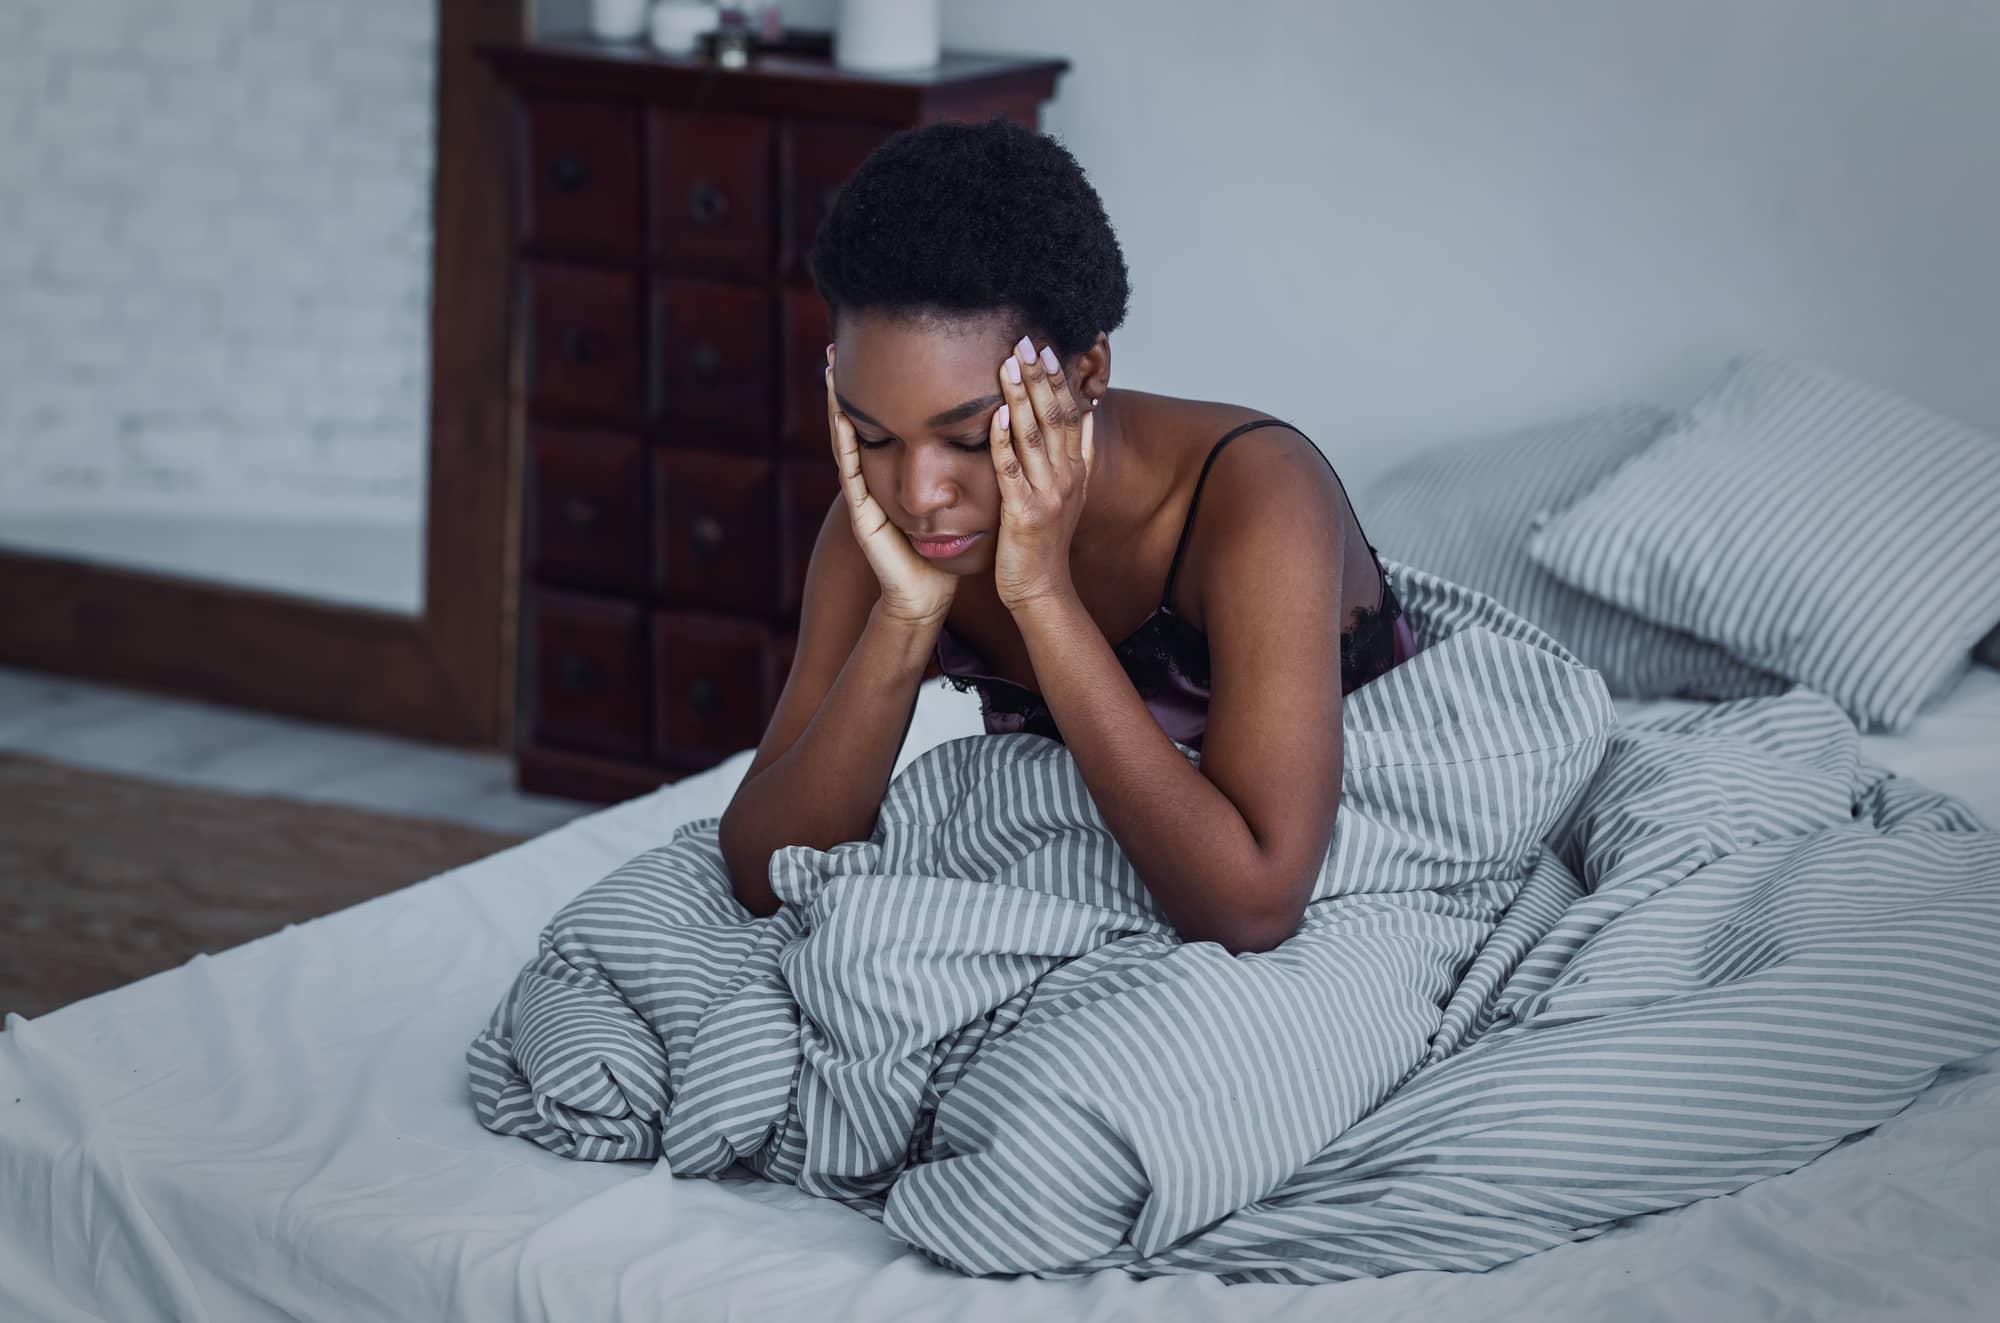 is sleep apnea dangerous